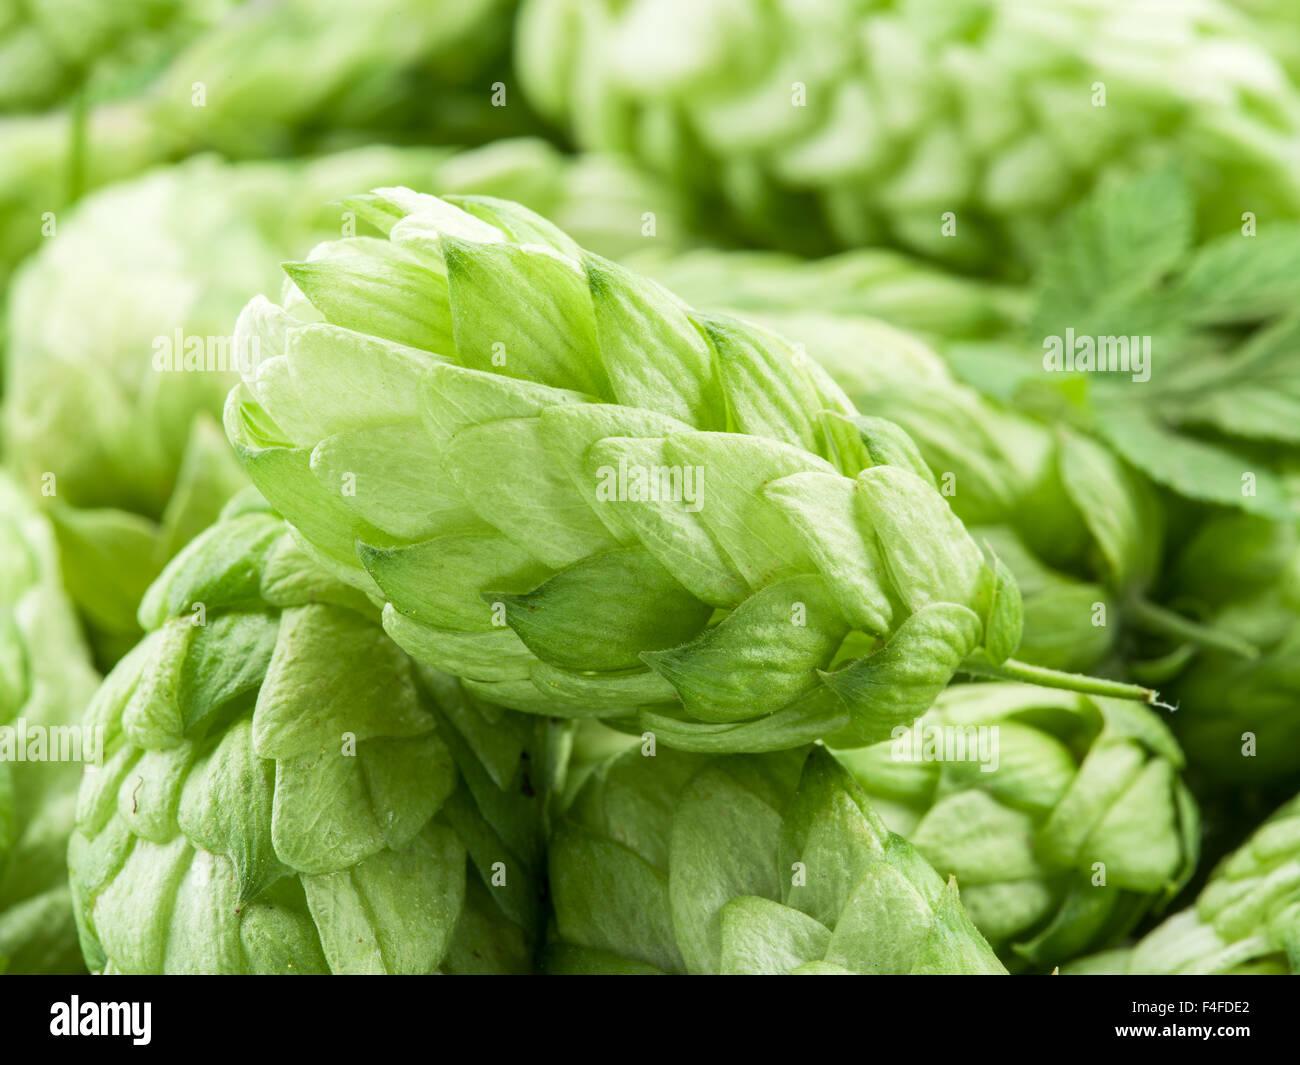 Green hop cones -  ingredient in the beer production. - Stock Image